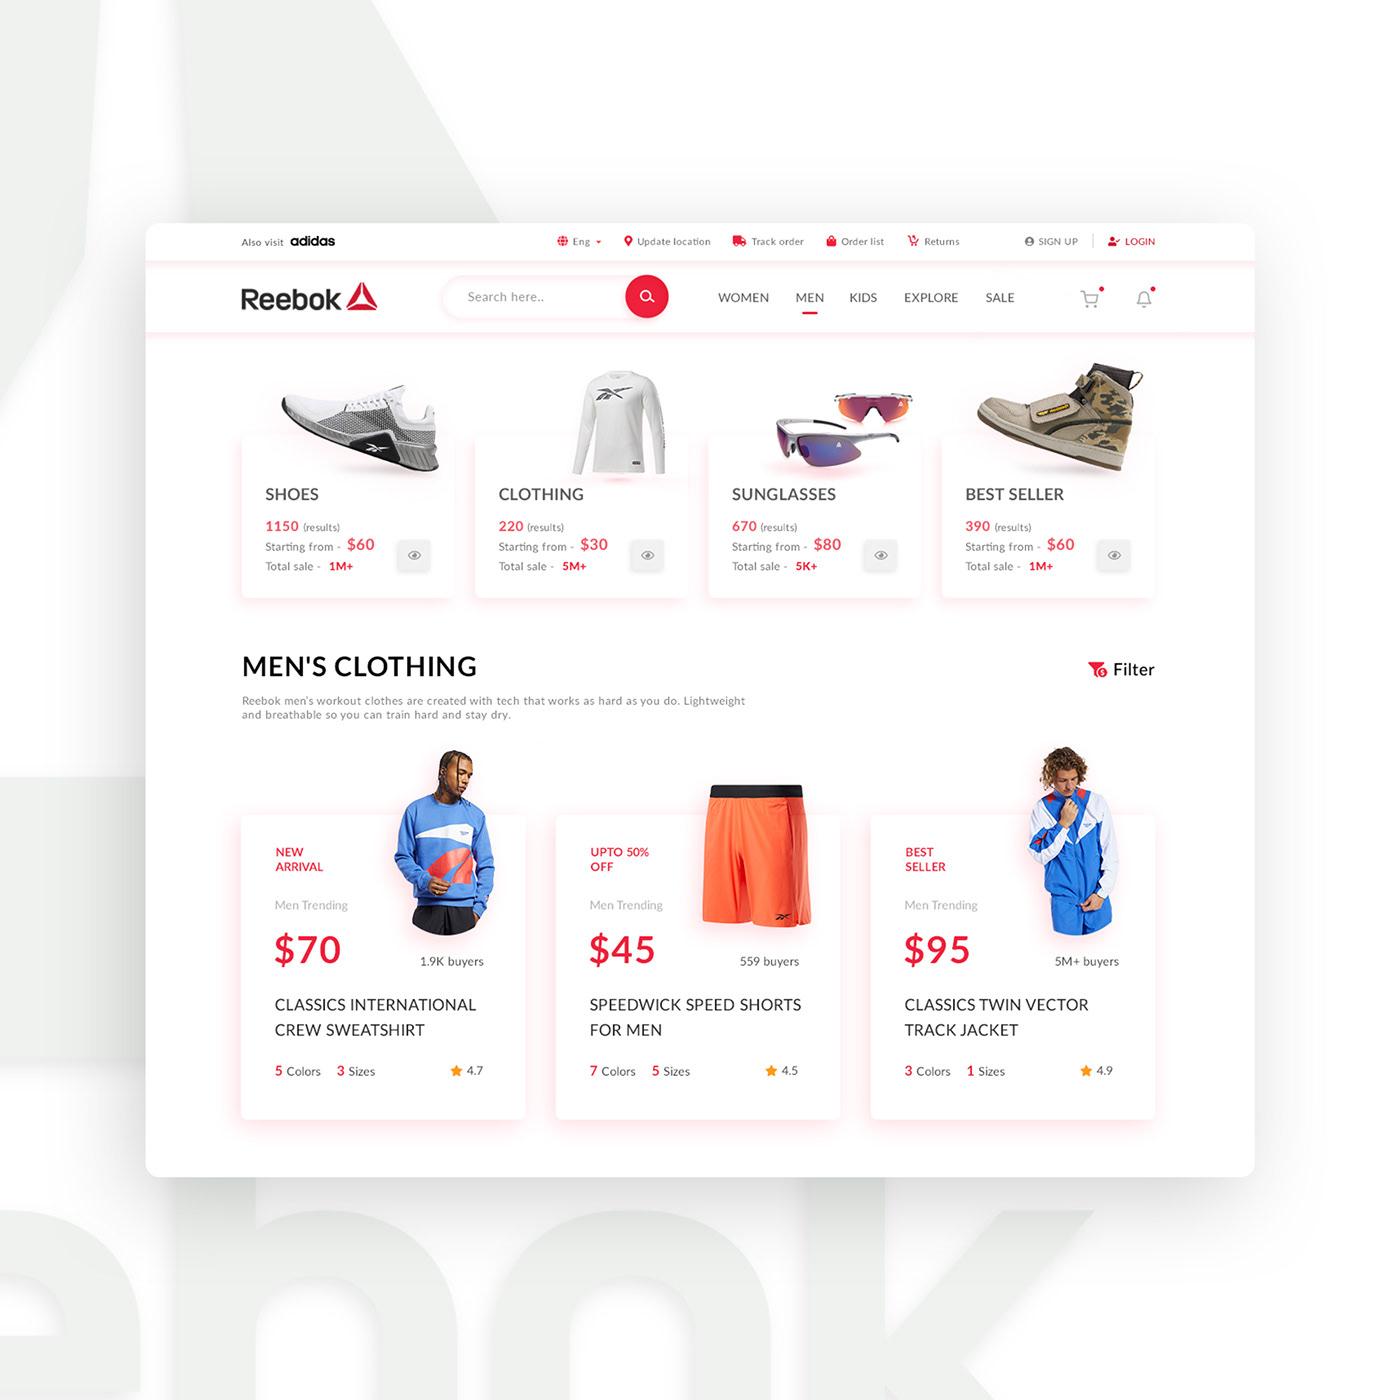 Clean UI Design Inspiration designers designs Logo Designs minimal design ui designs UX Designs web designs web developers